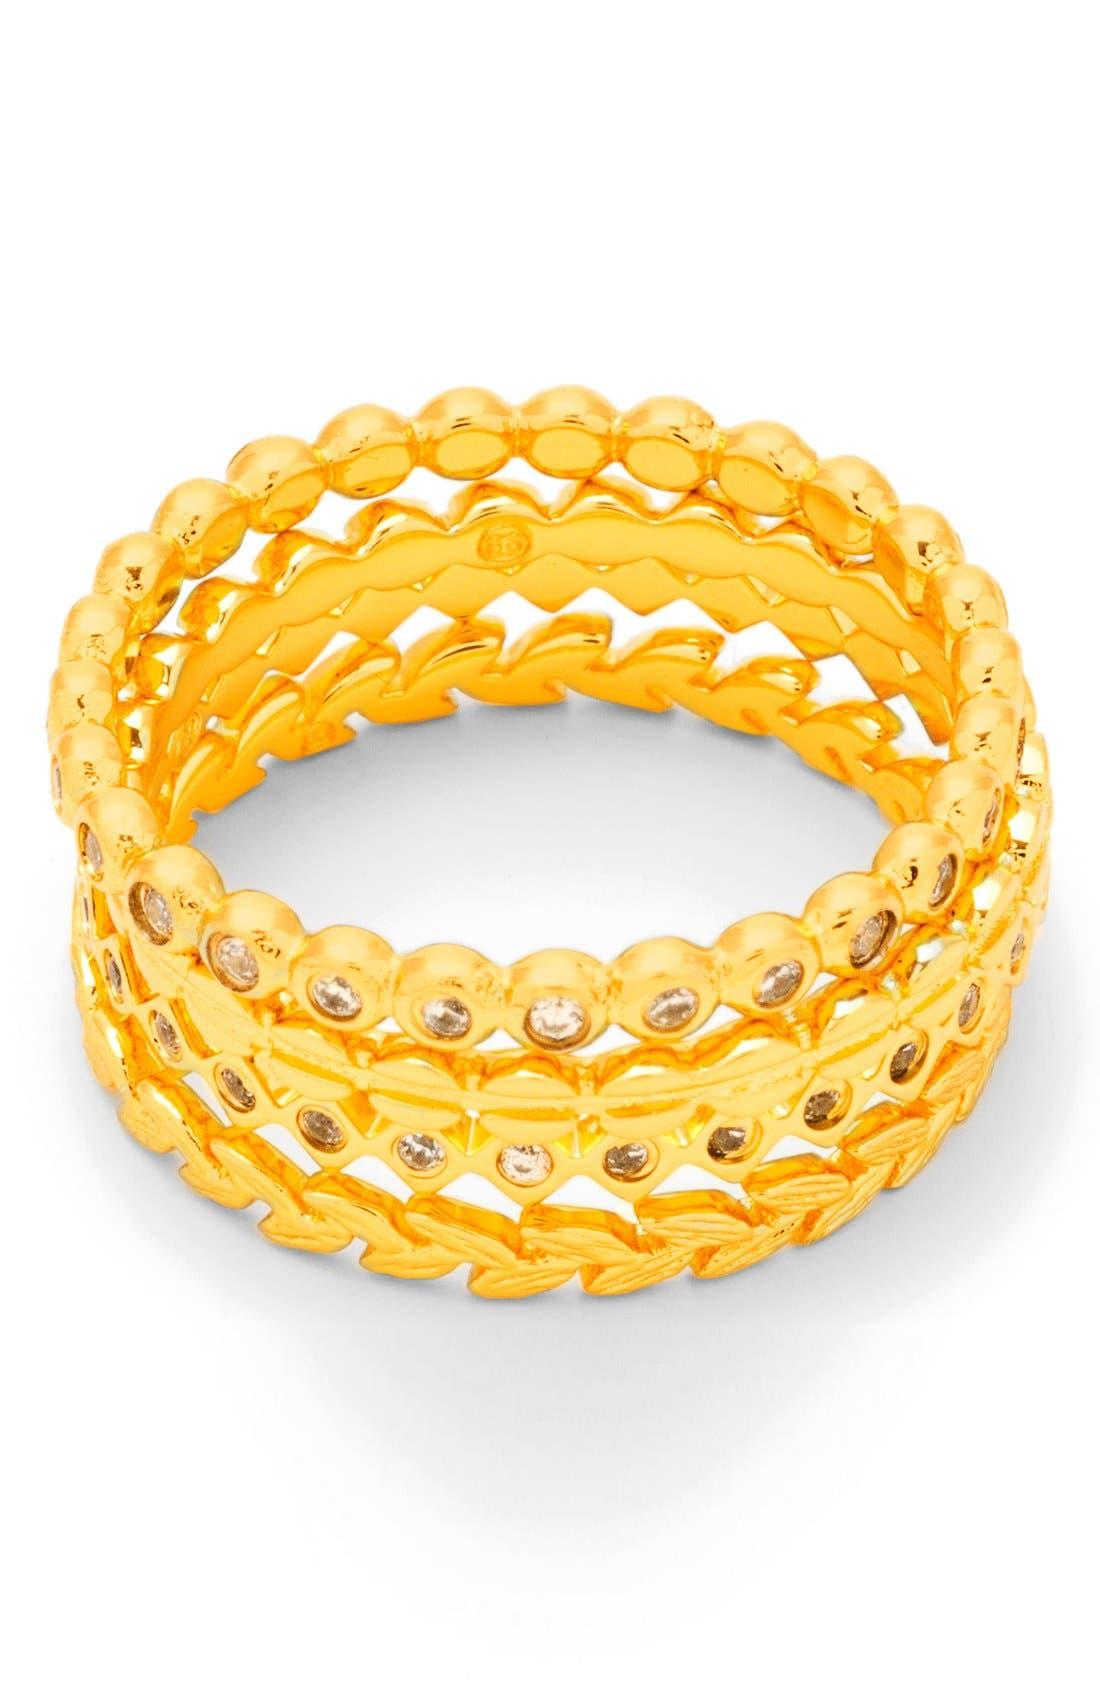 gorjana Stackable Set of 4 Band Rings